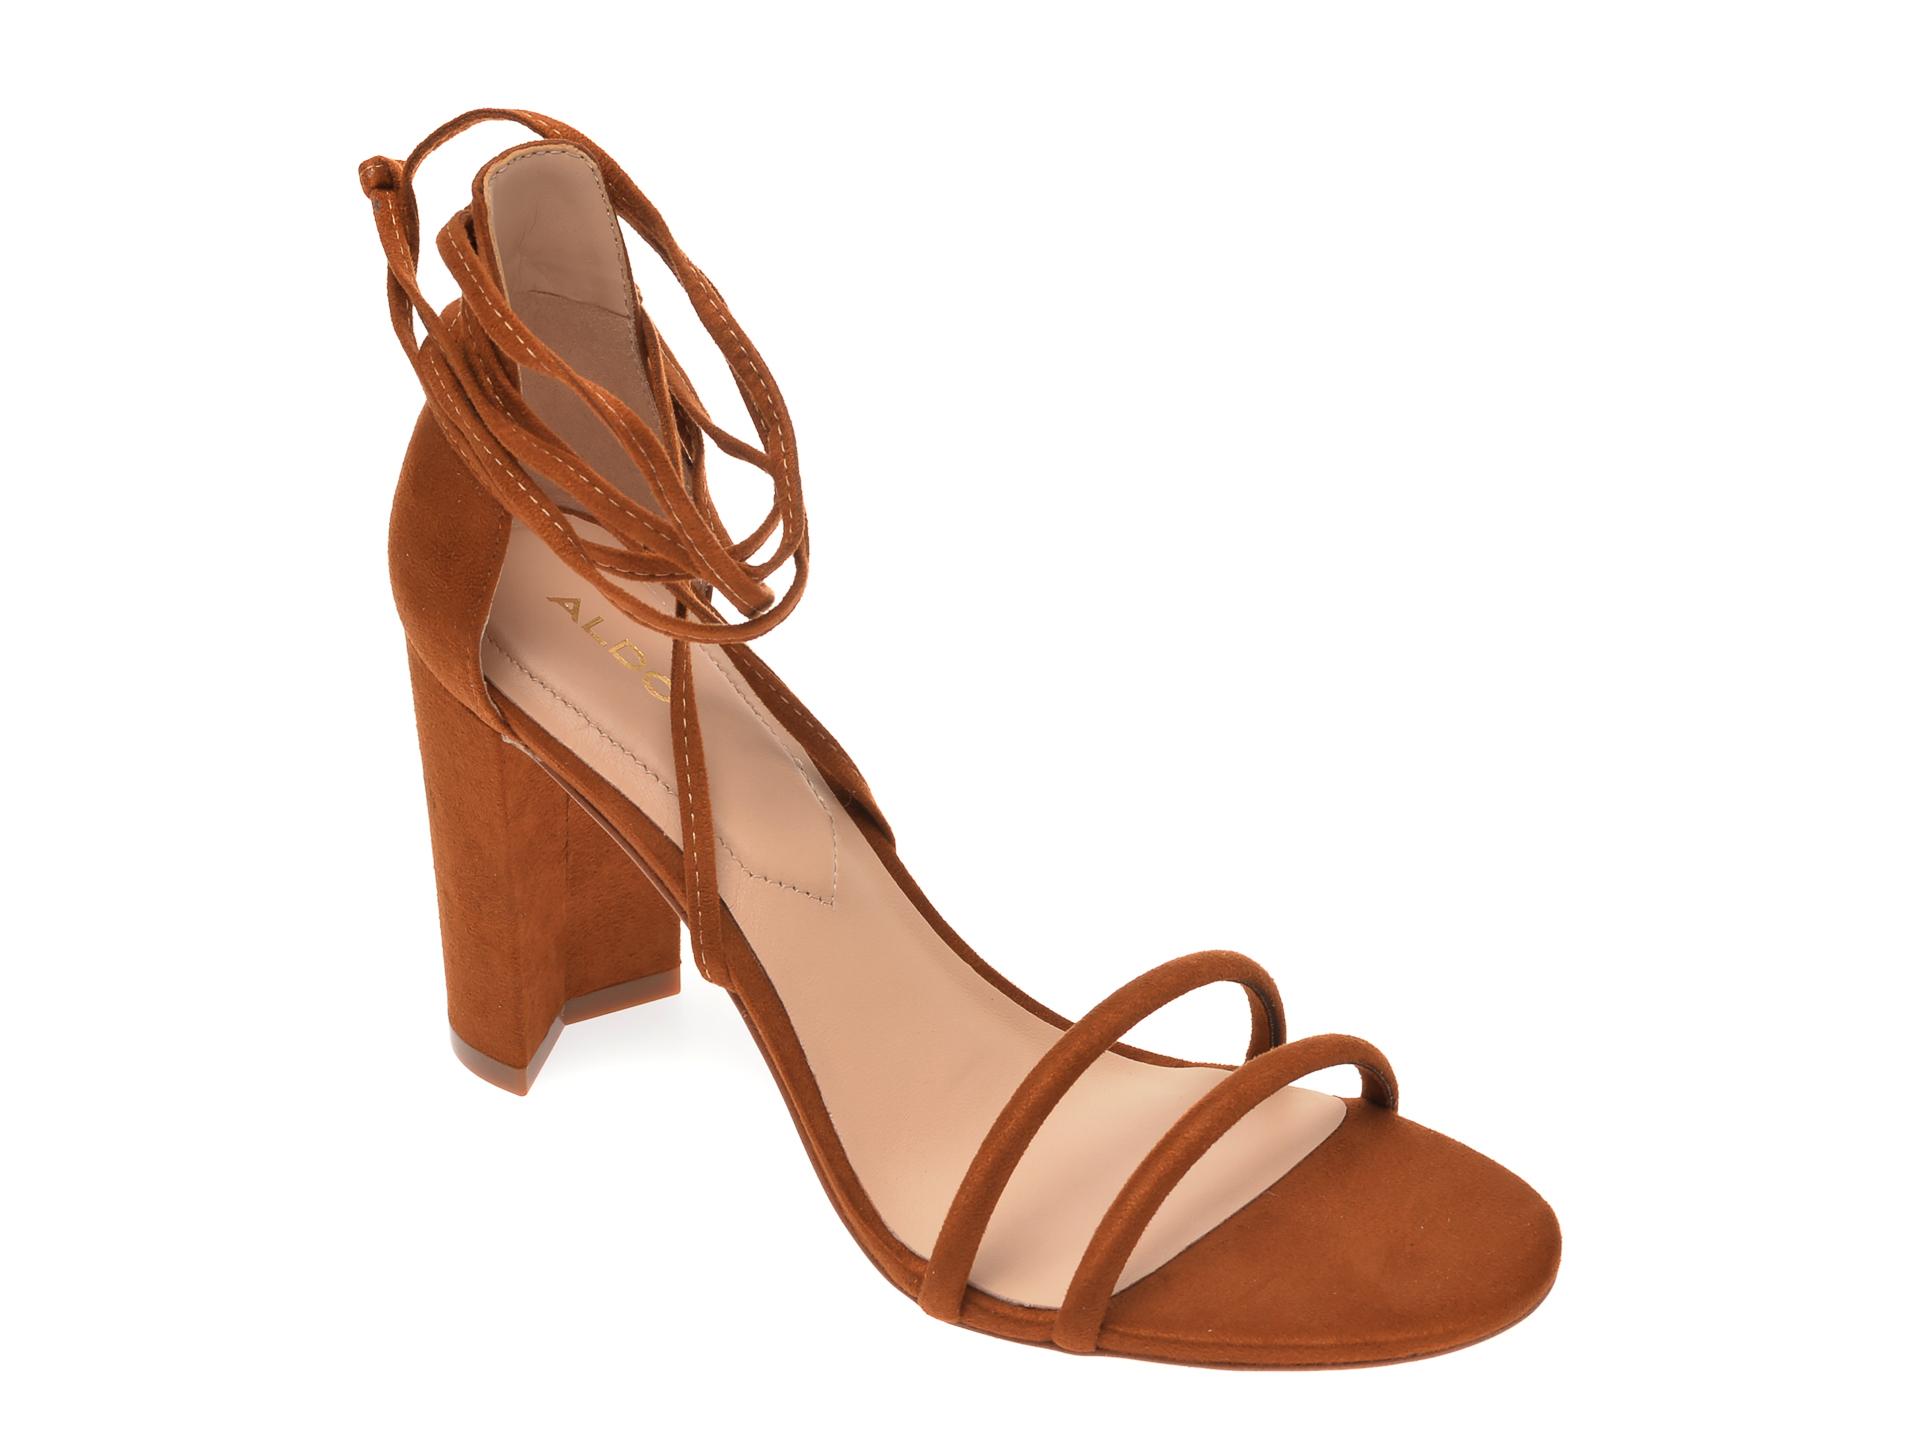 Sandale ALDO maro, Nyderia230, din piele ecologica